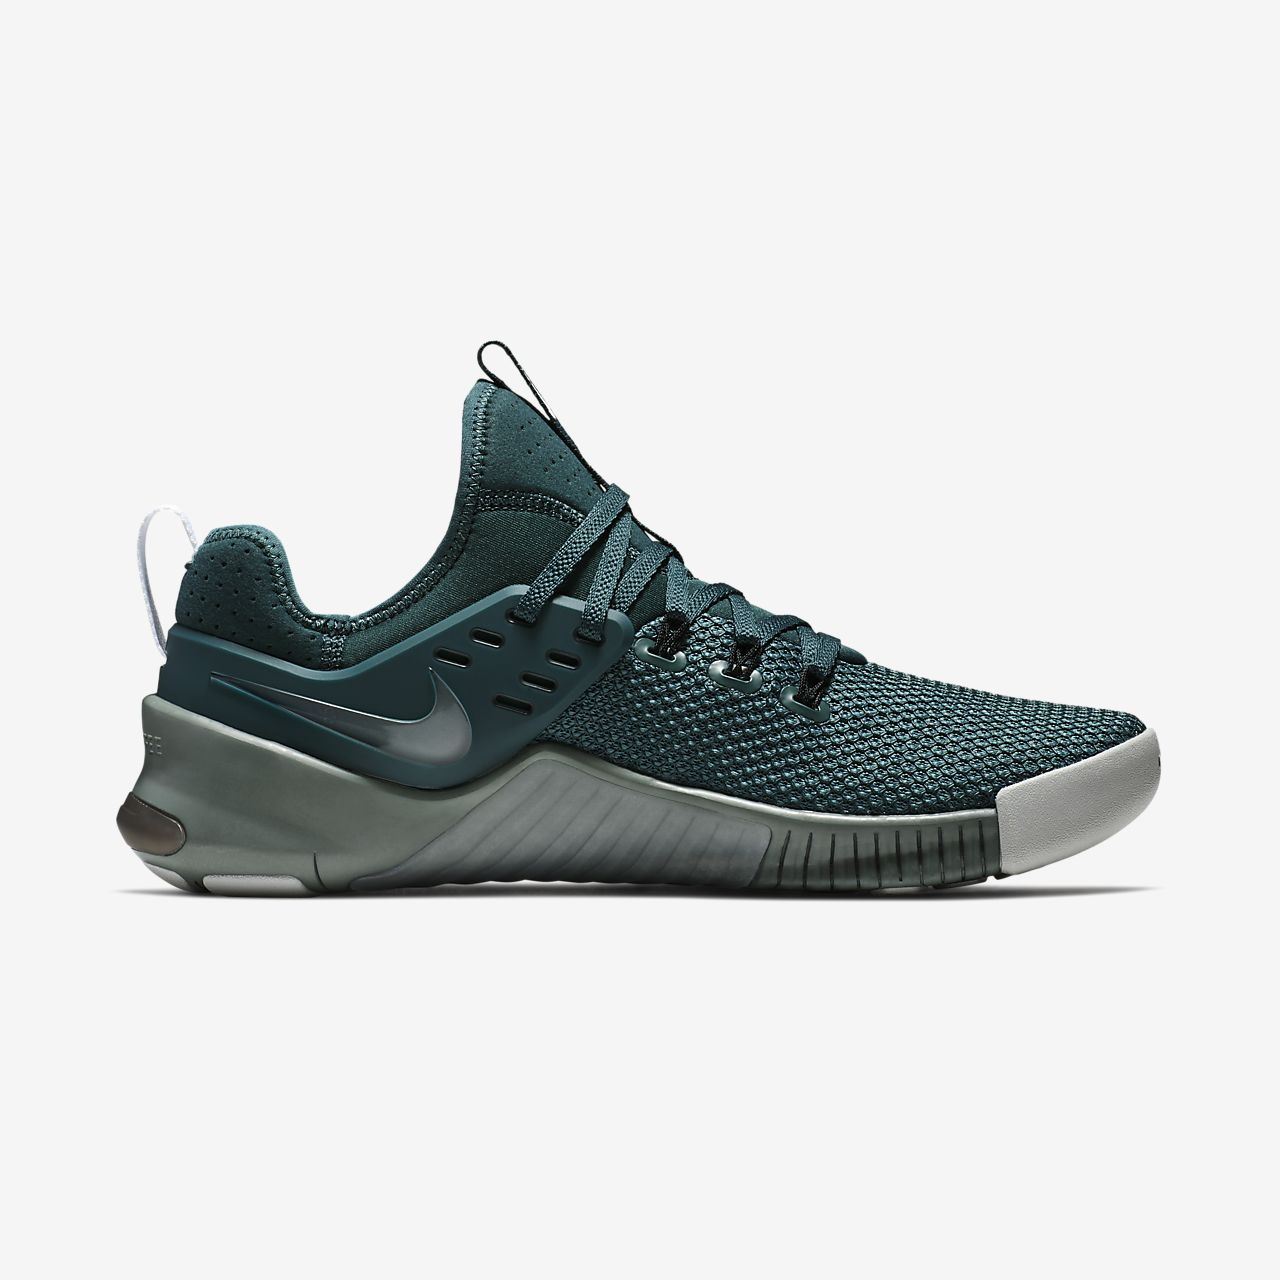 ... Chaussure de training Nike Free x Metcon